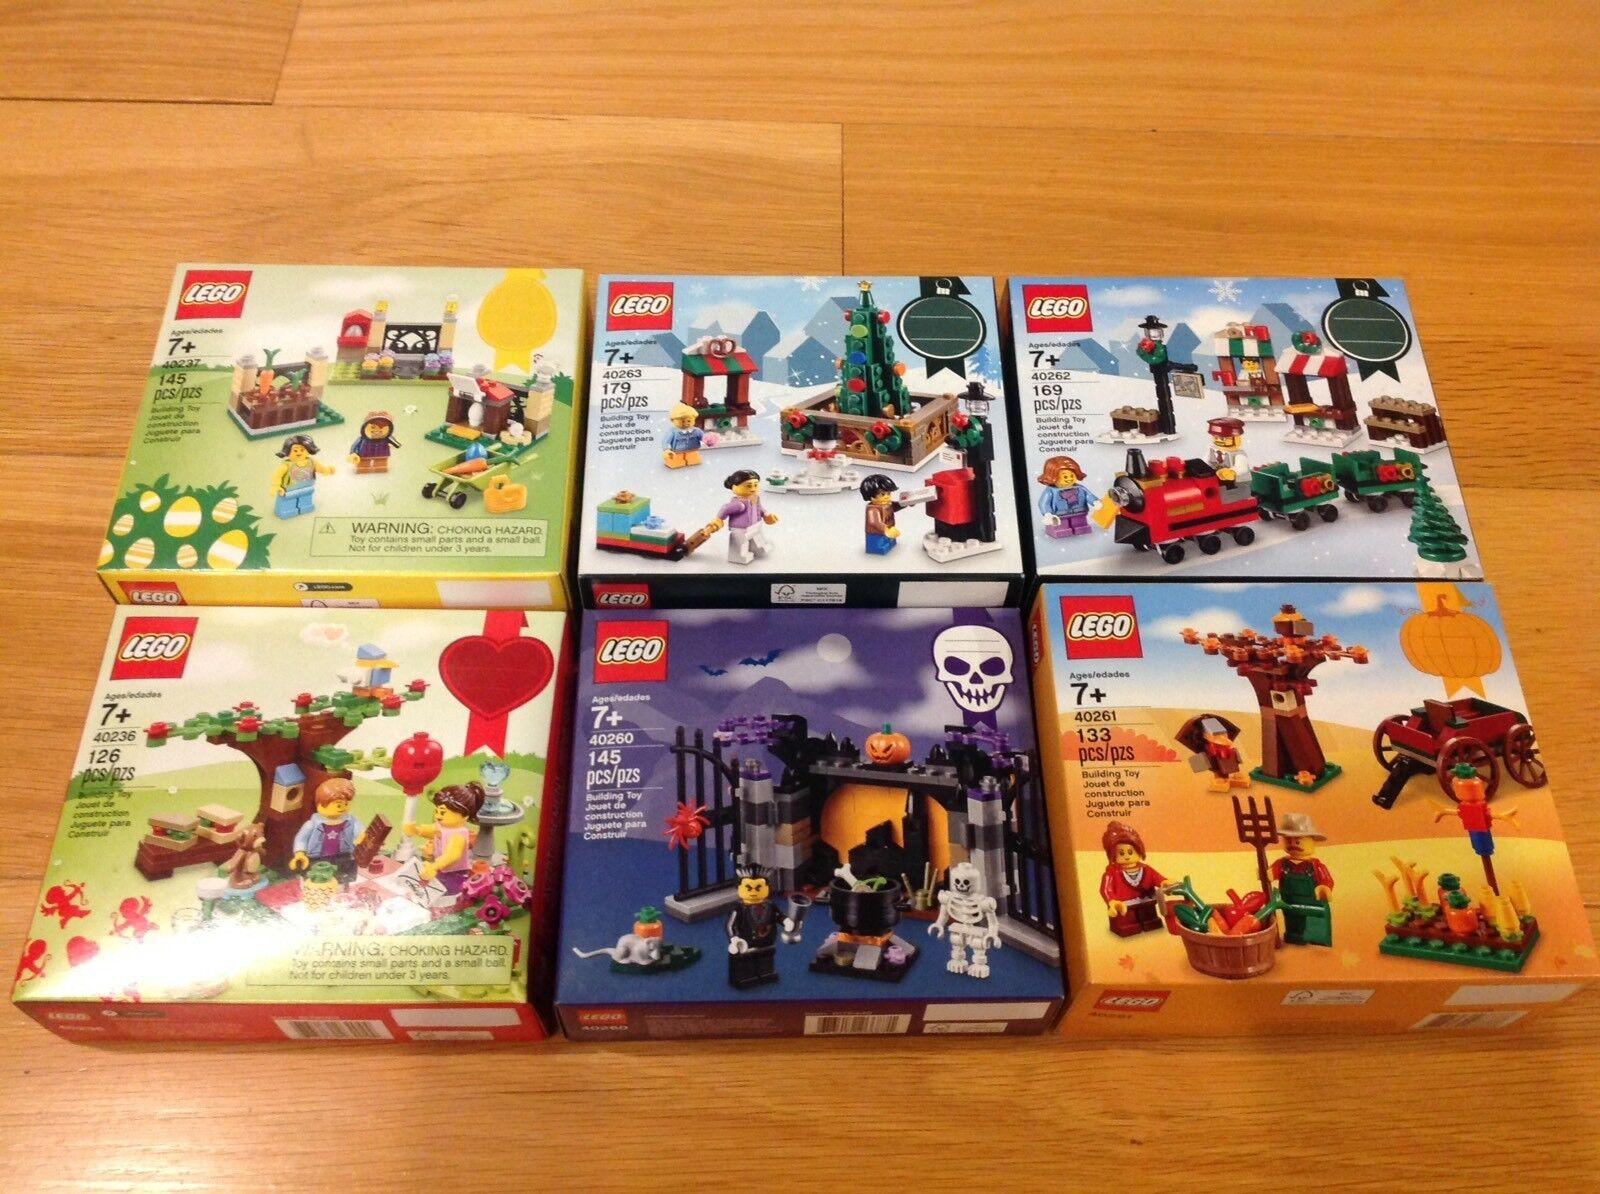 Lego Holiday Seasonal Sets (40236, 40237, 40260, 40261, 40262, 40263)